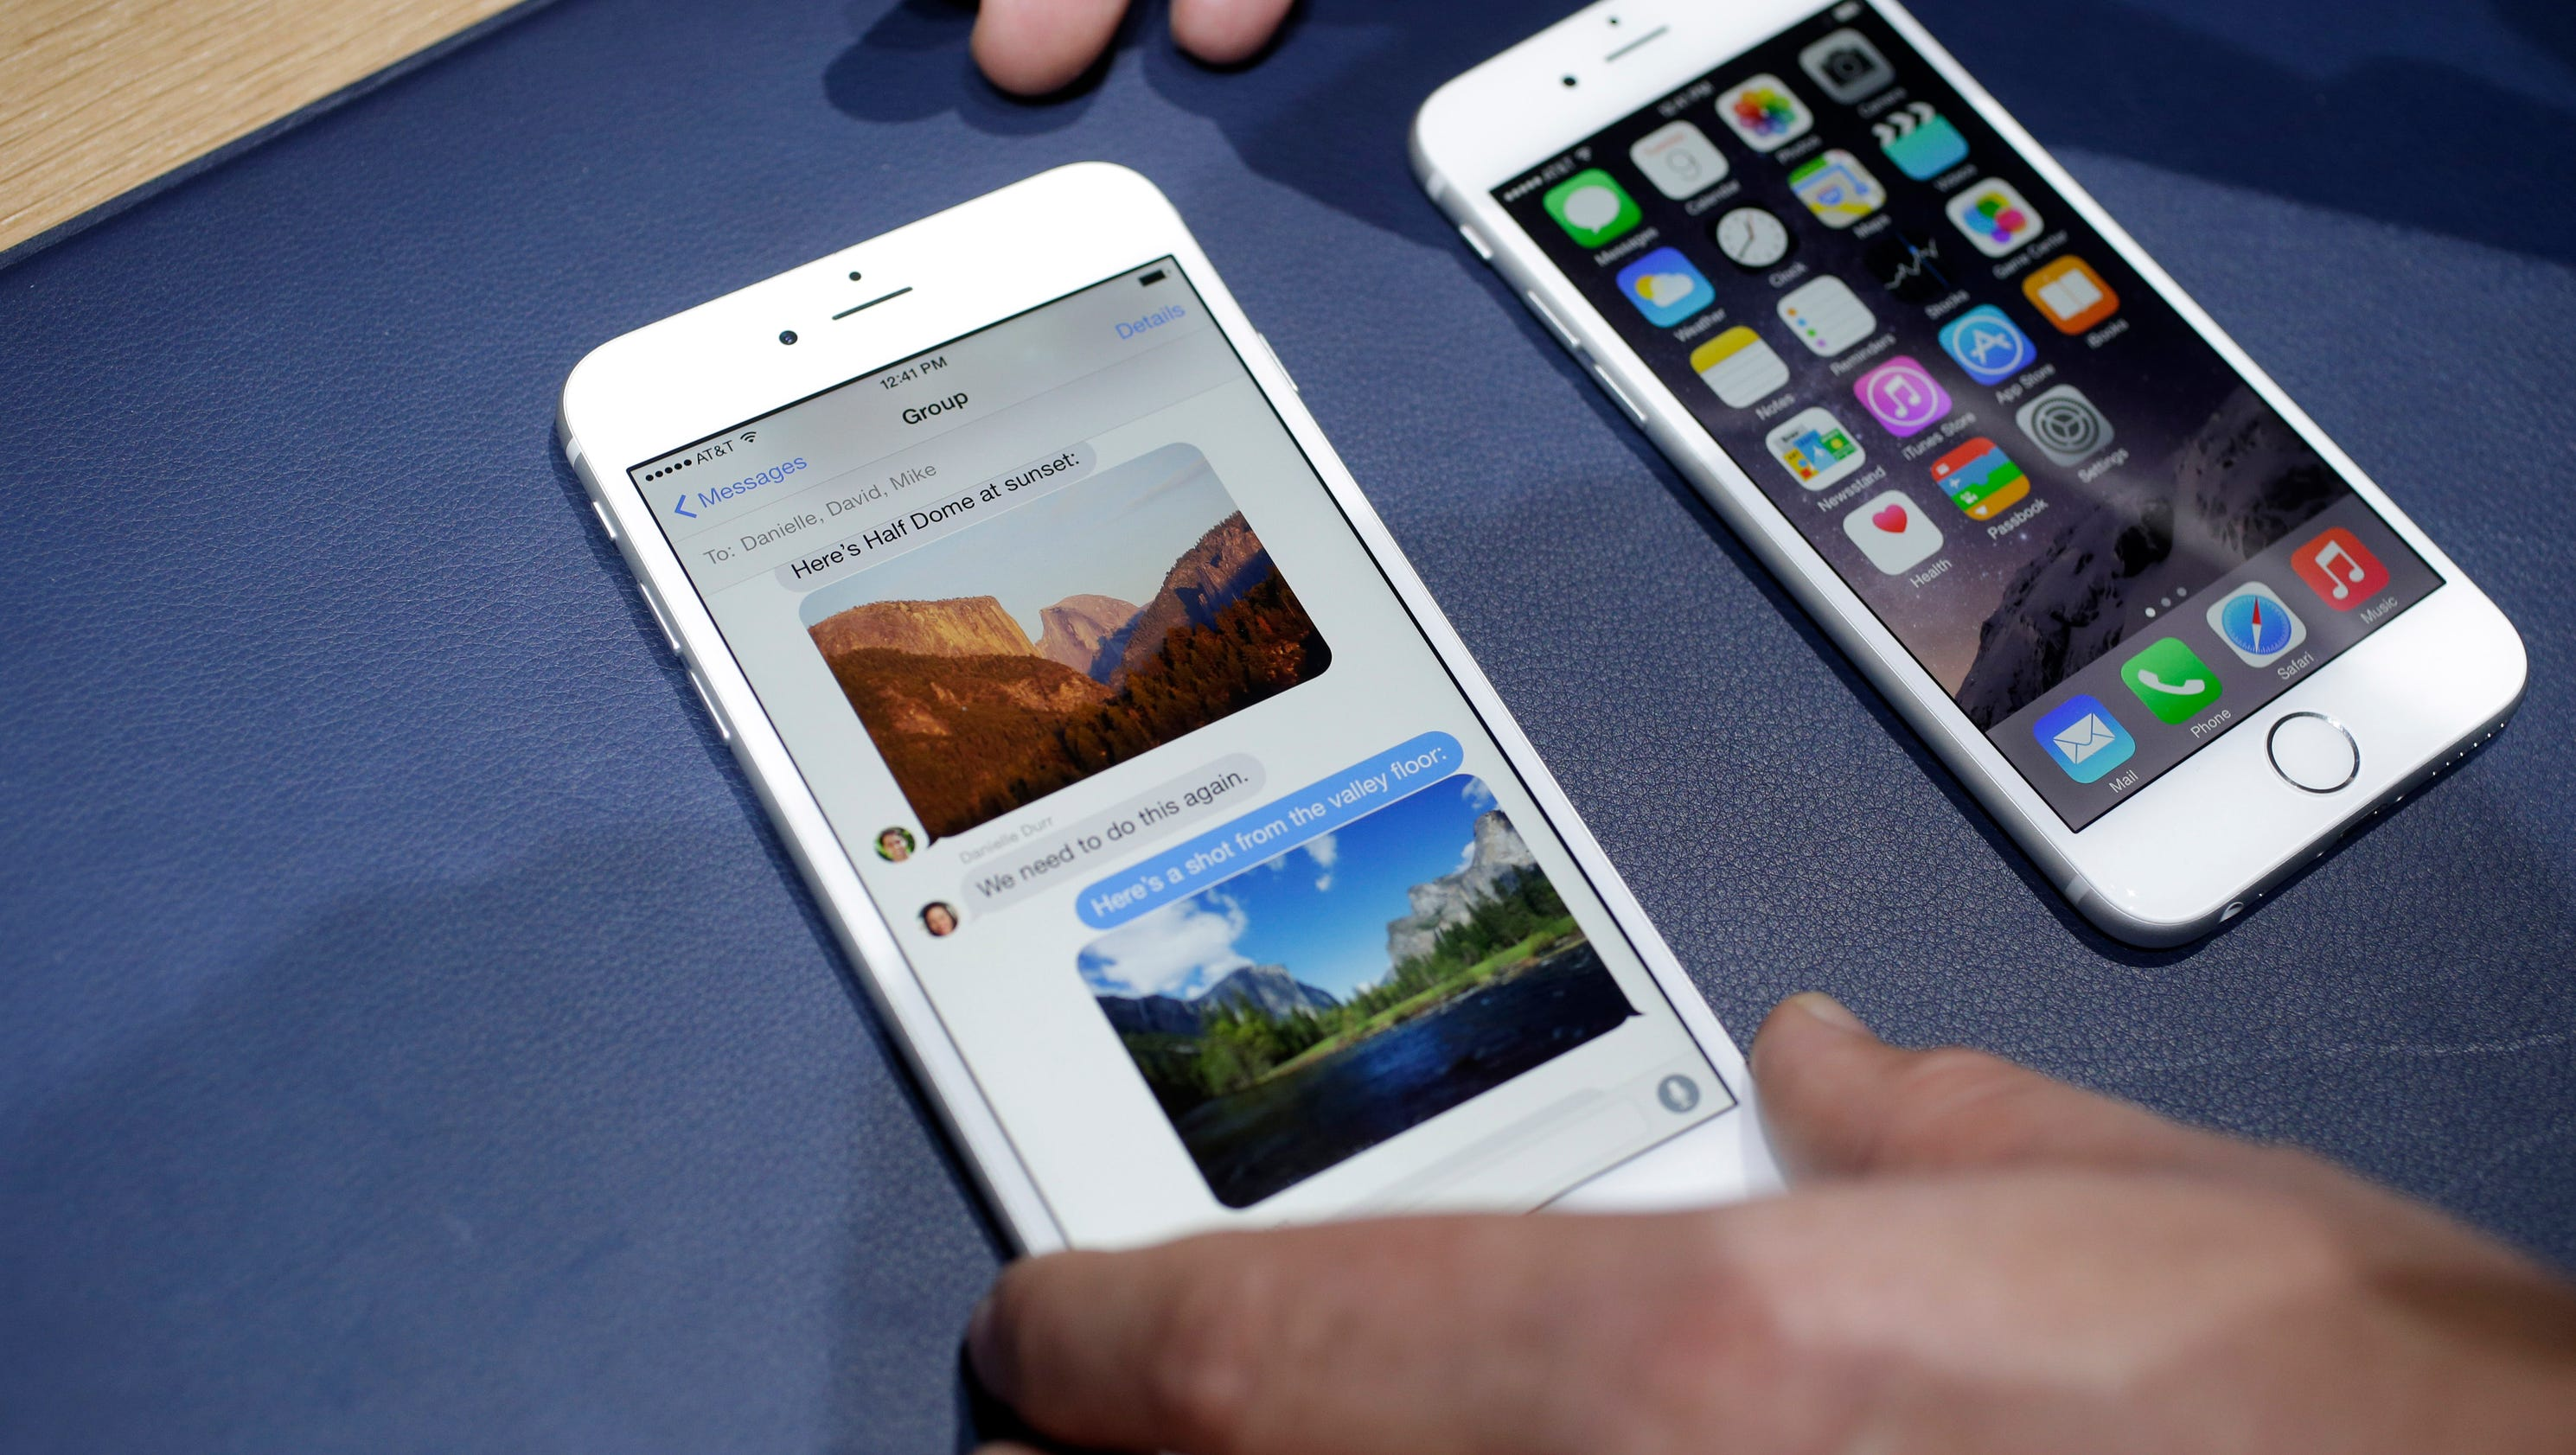 Apple beats Samsung in Q4 smartphone sales